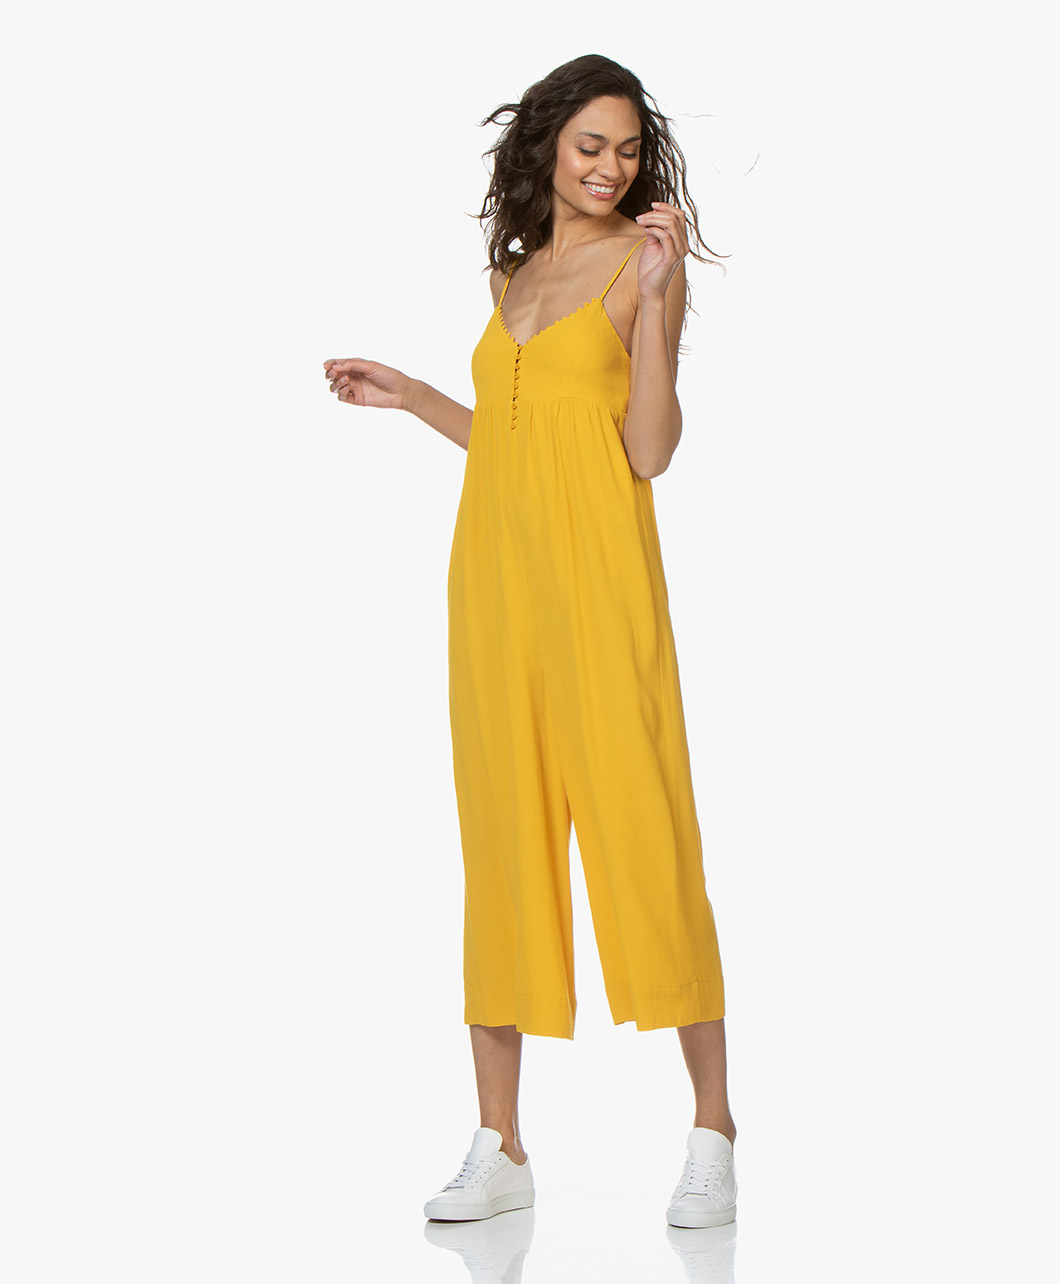 Amber Marie Goetz ba&sh fever sleeveless cropped jumpsuit - yellow amber